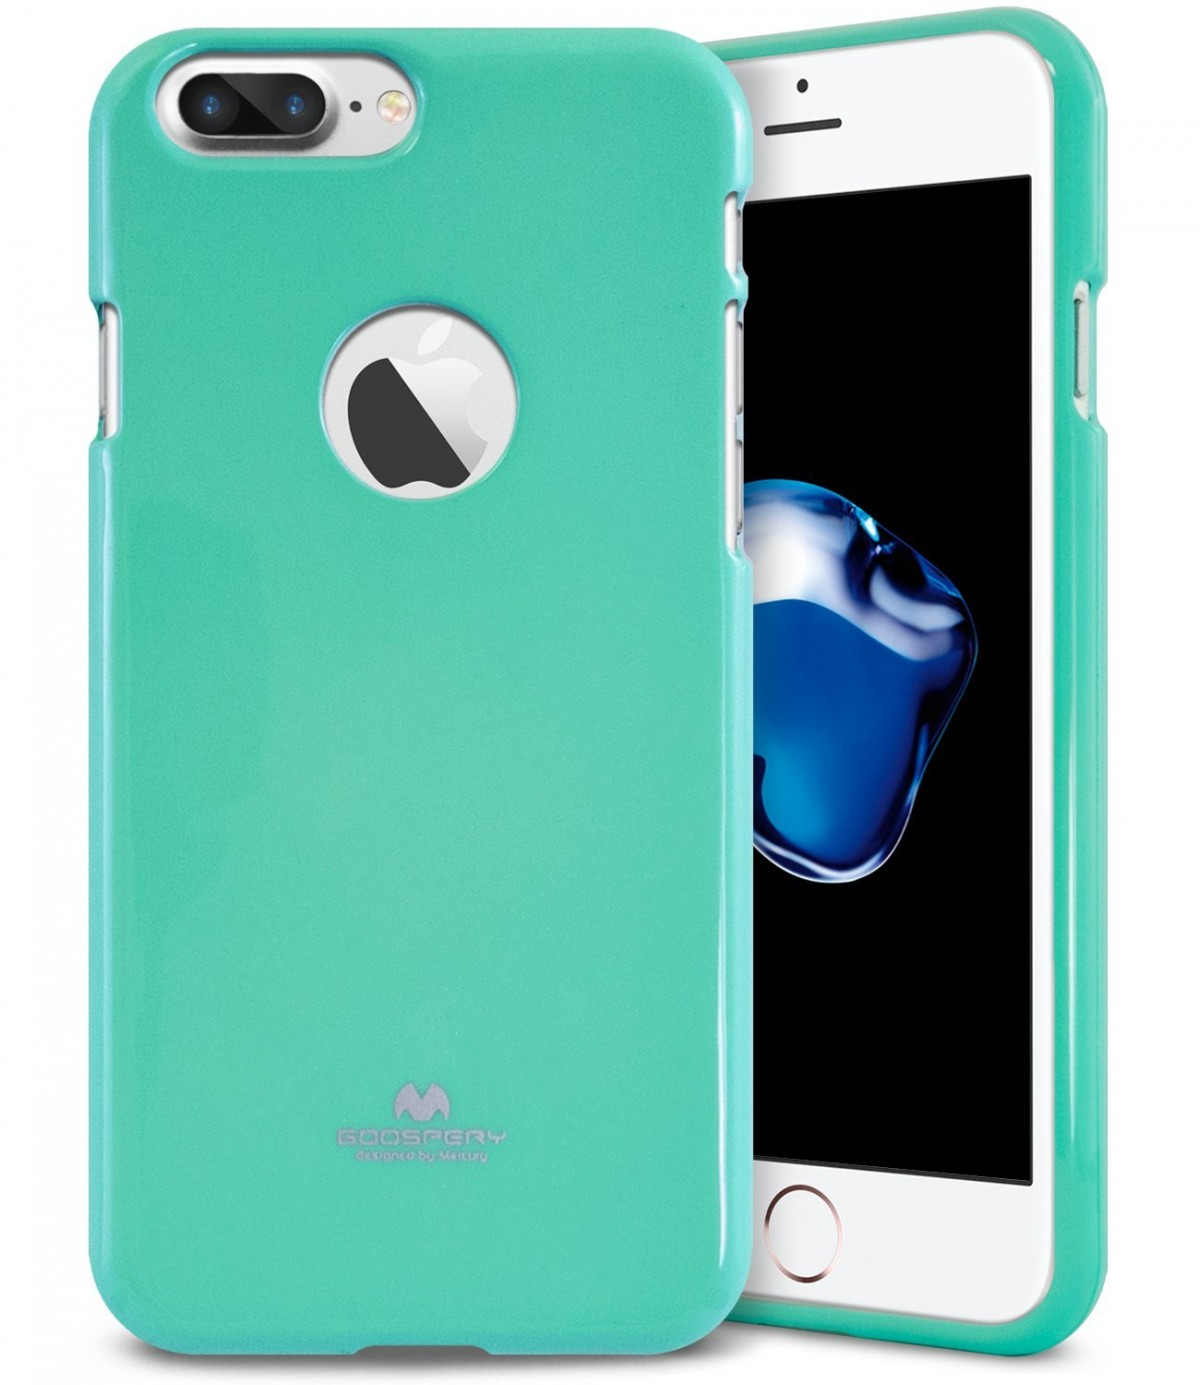 Pouzdro Goospery Mercury Jelly Case Apple iPhone 8 Plus / 7 Plus - Světle zelené / Mint